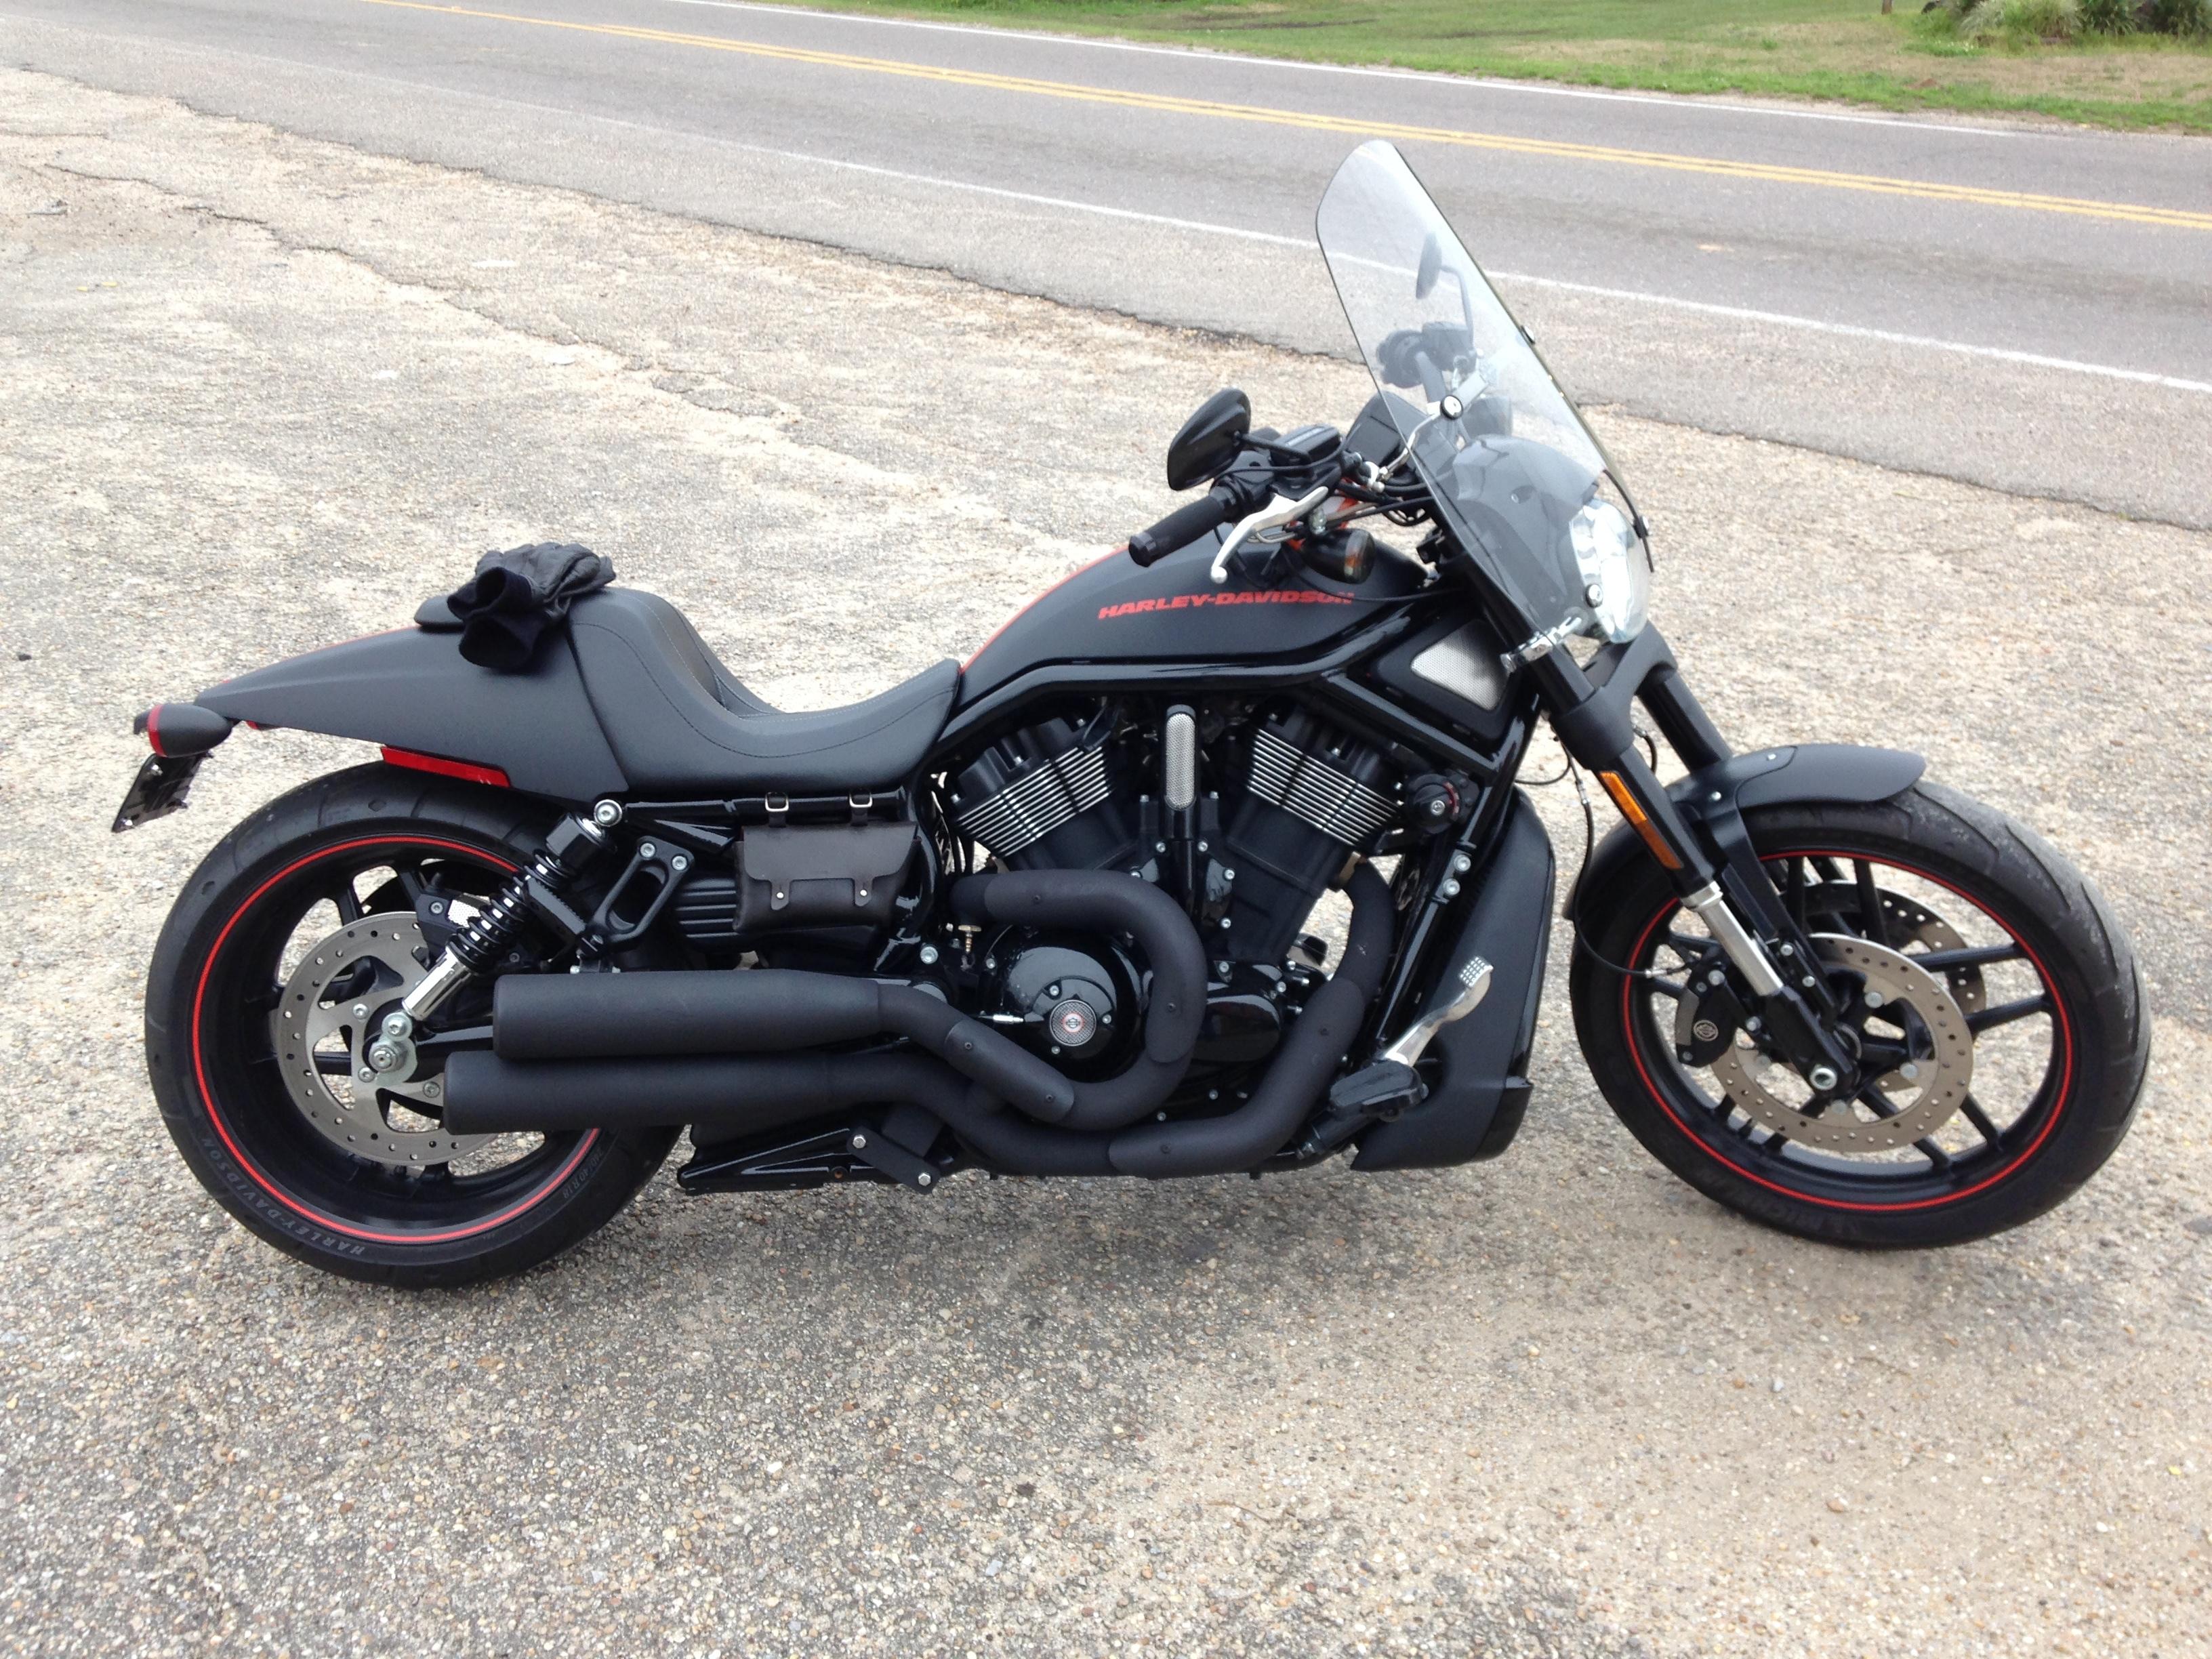 Photo 2013 Harley-Davidson NIGHT ROD SPECIAL $10300218.36218.36